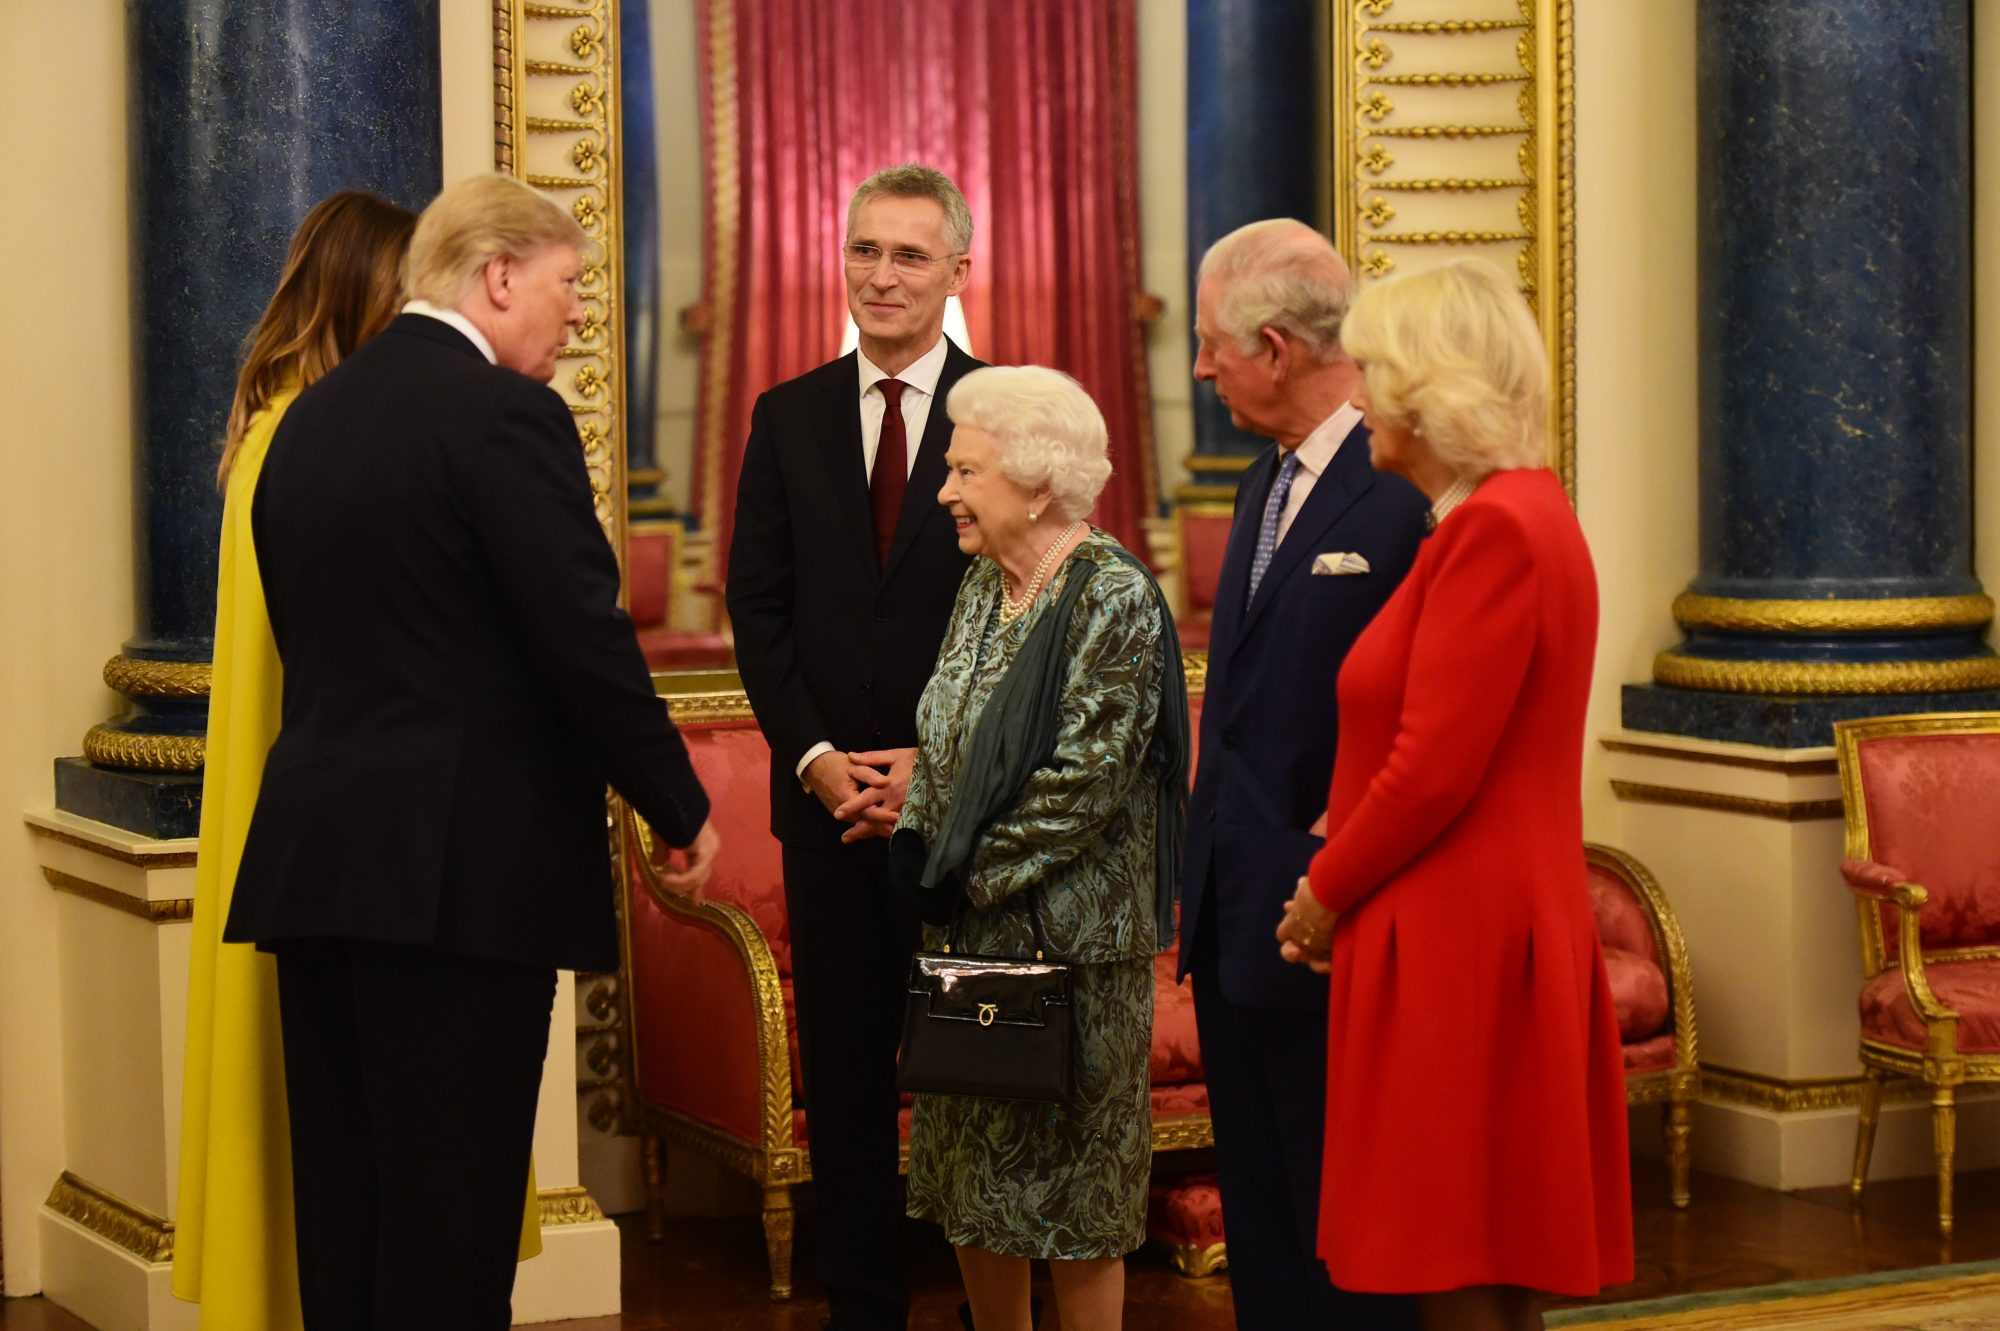 Donald Trump, Melania Trump, reina Isabel II, priíncipe Carlos